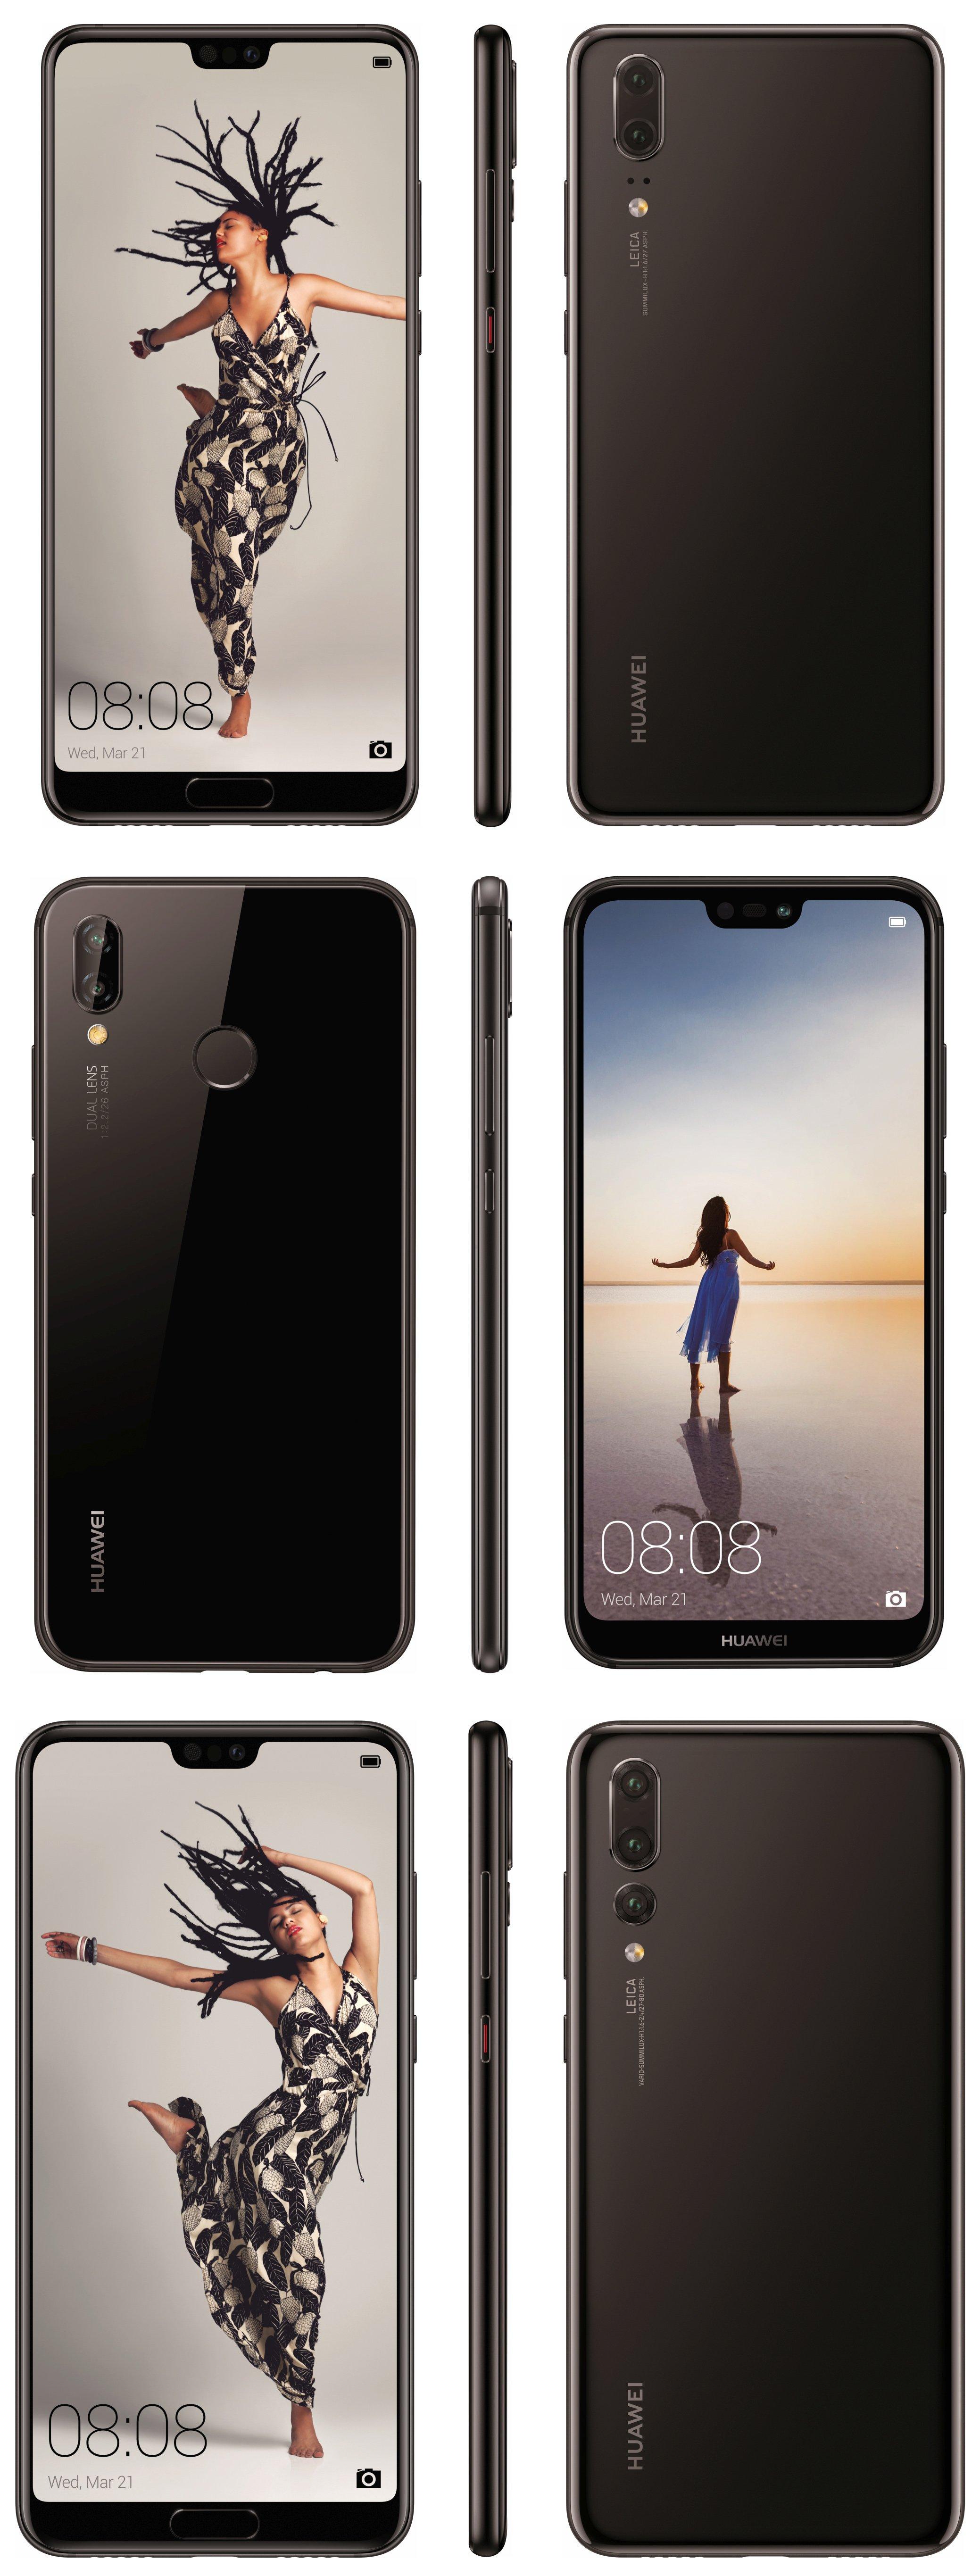 Huawei P20 -puhelimet mustana värinä.